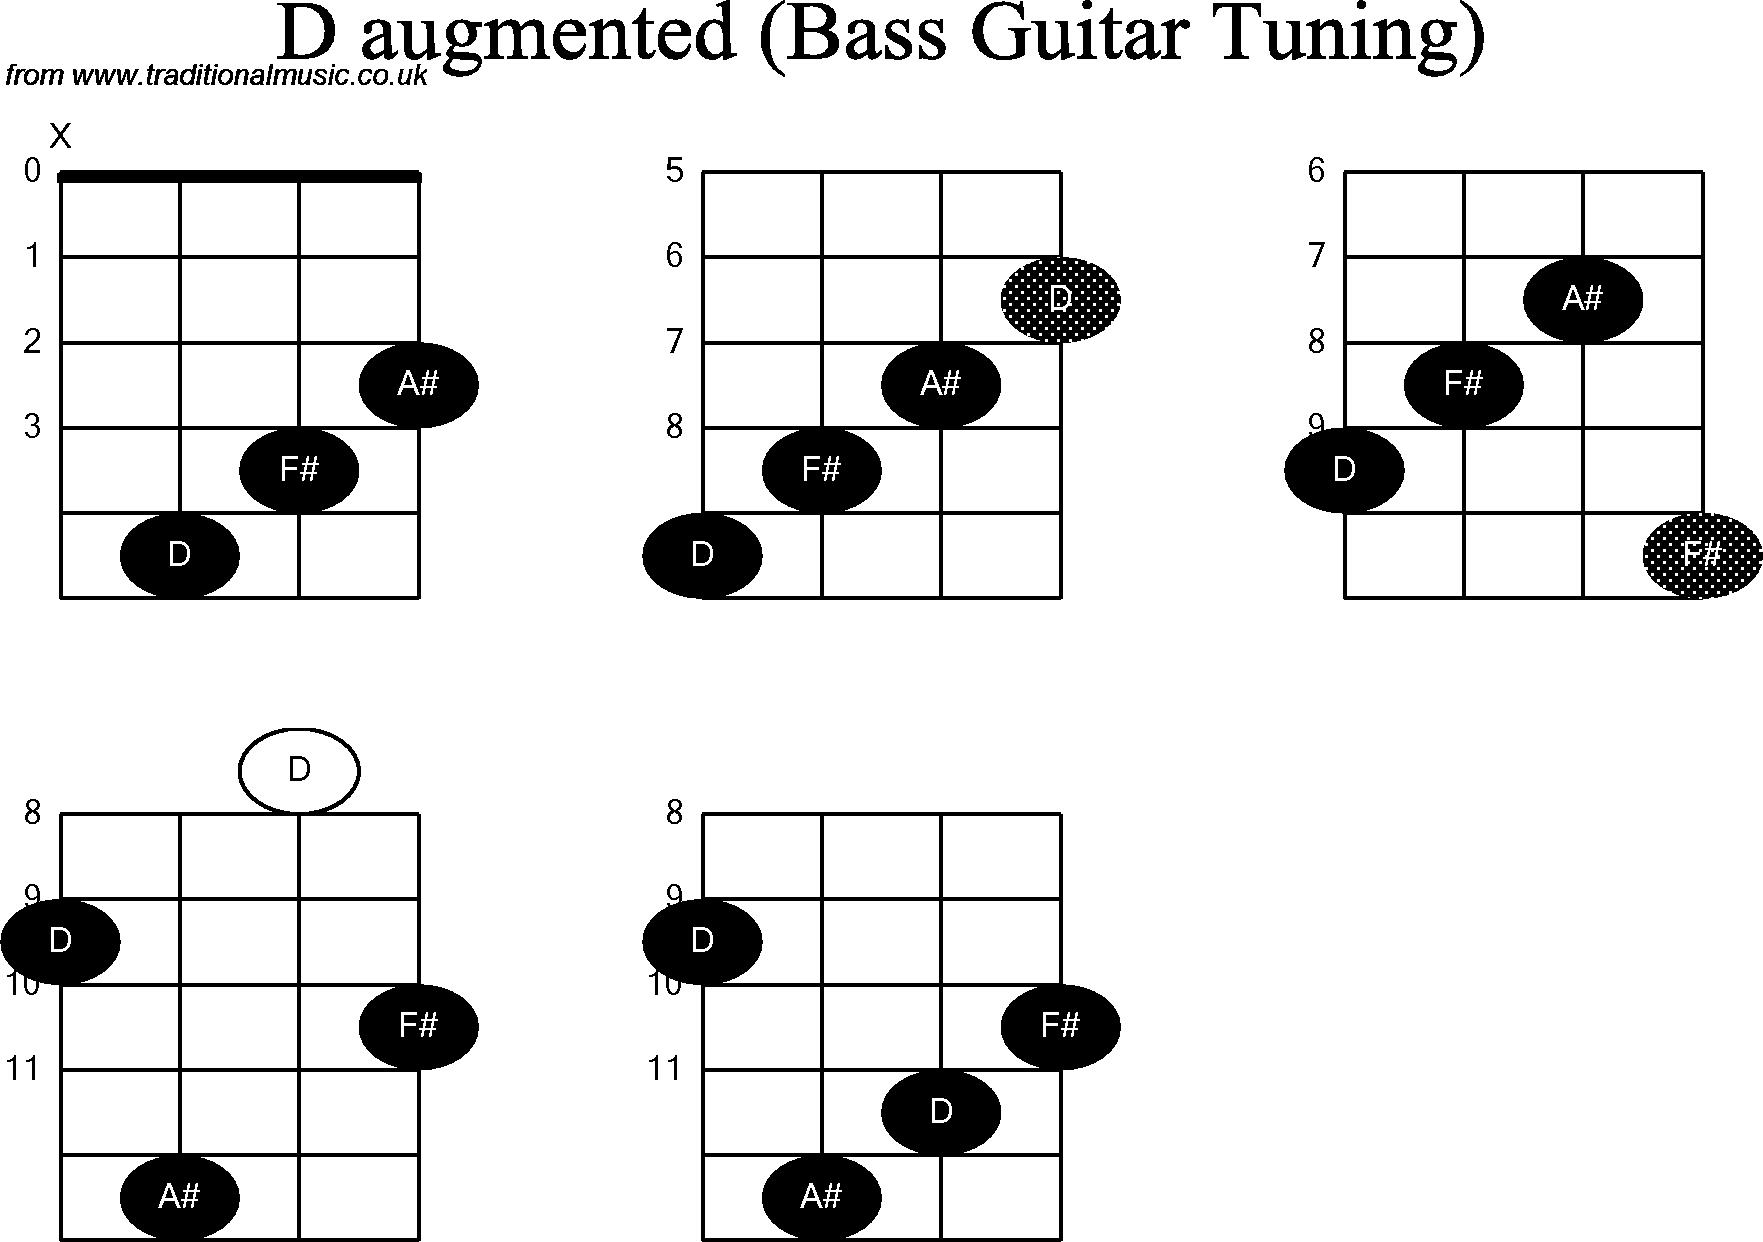 Bass Guitar Chords Bass Guitar Chord Diagrams For D Augmented